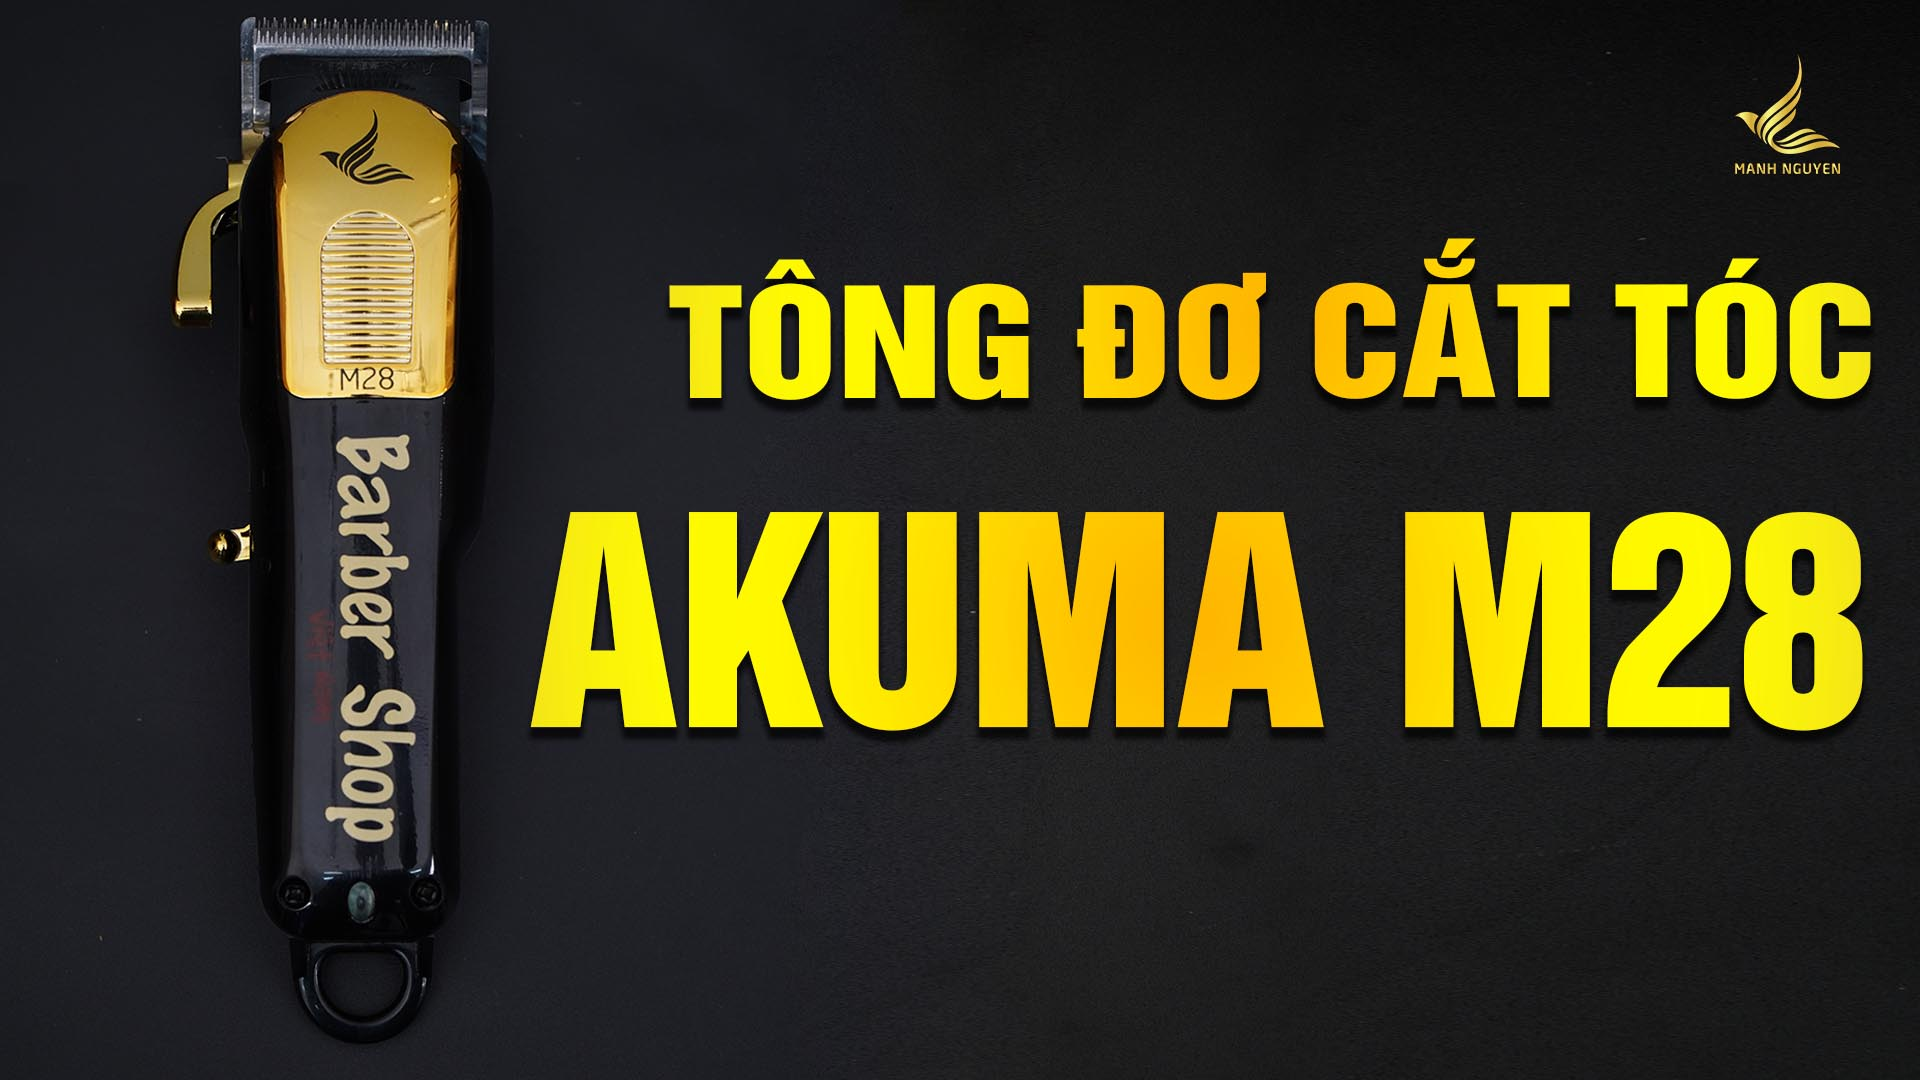 tong do cat toc akuma m28